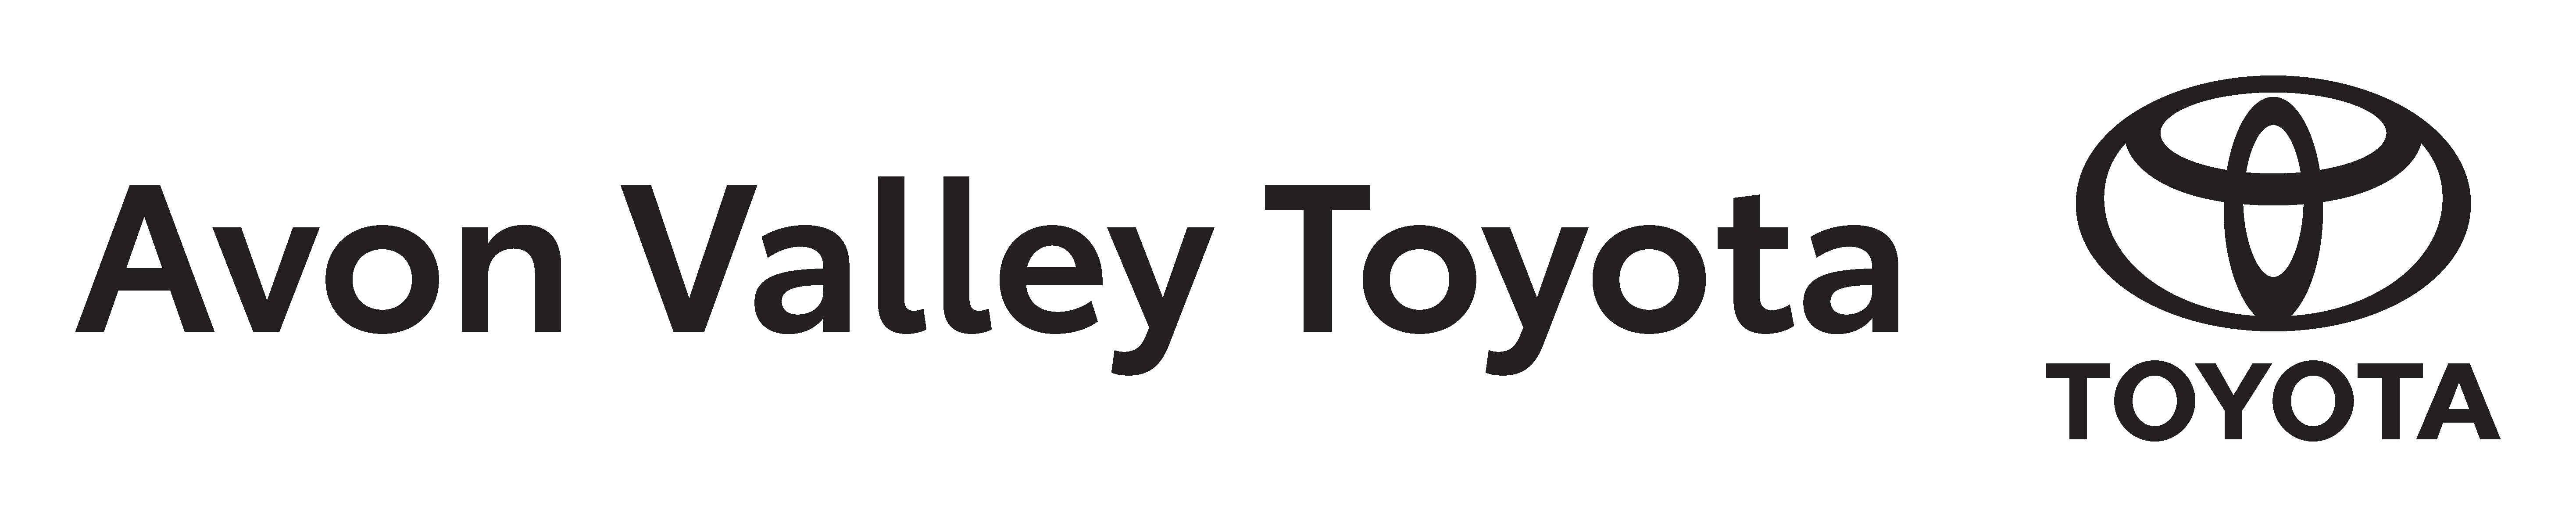 Avon Valley Toyota